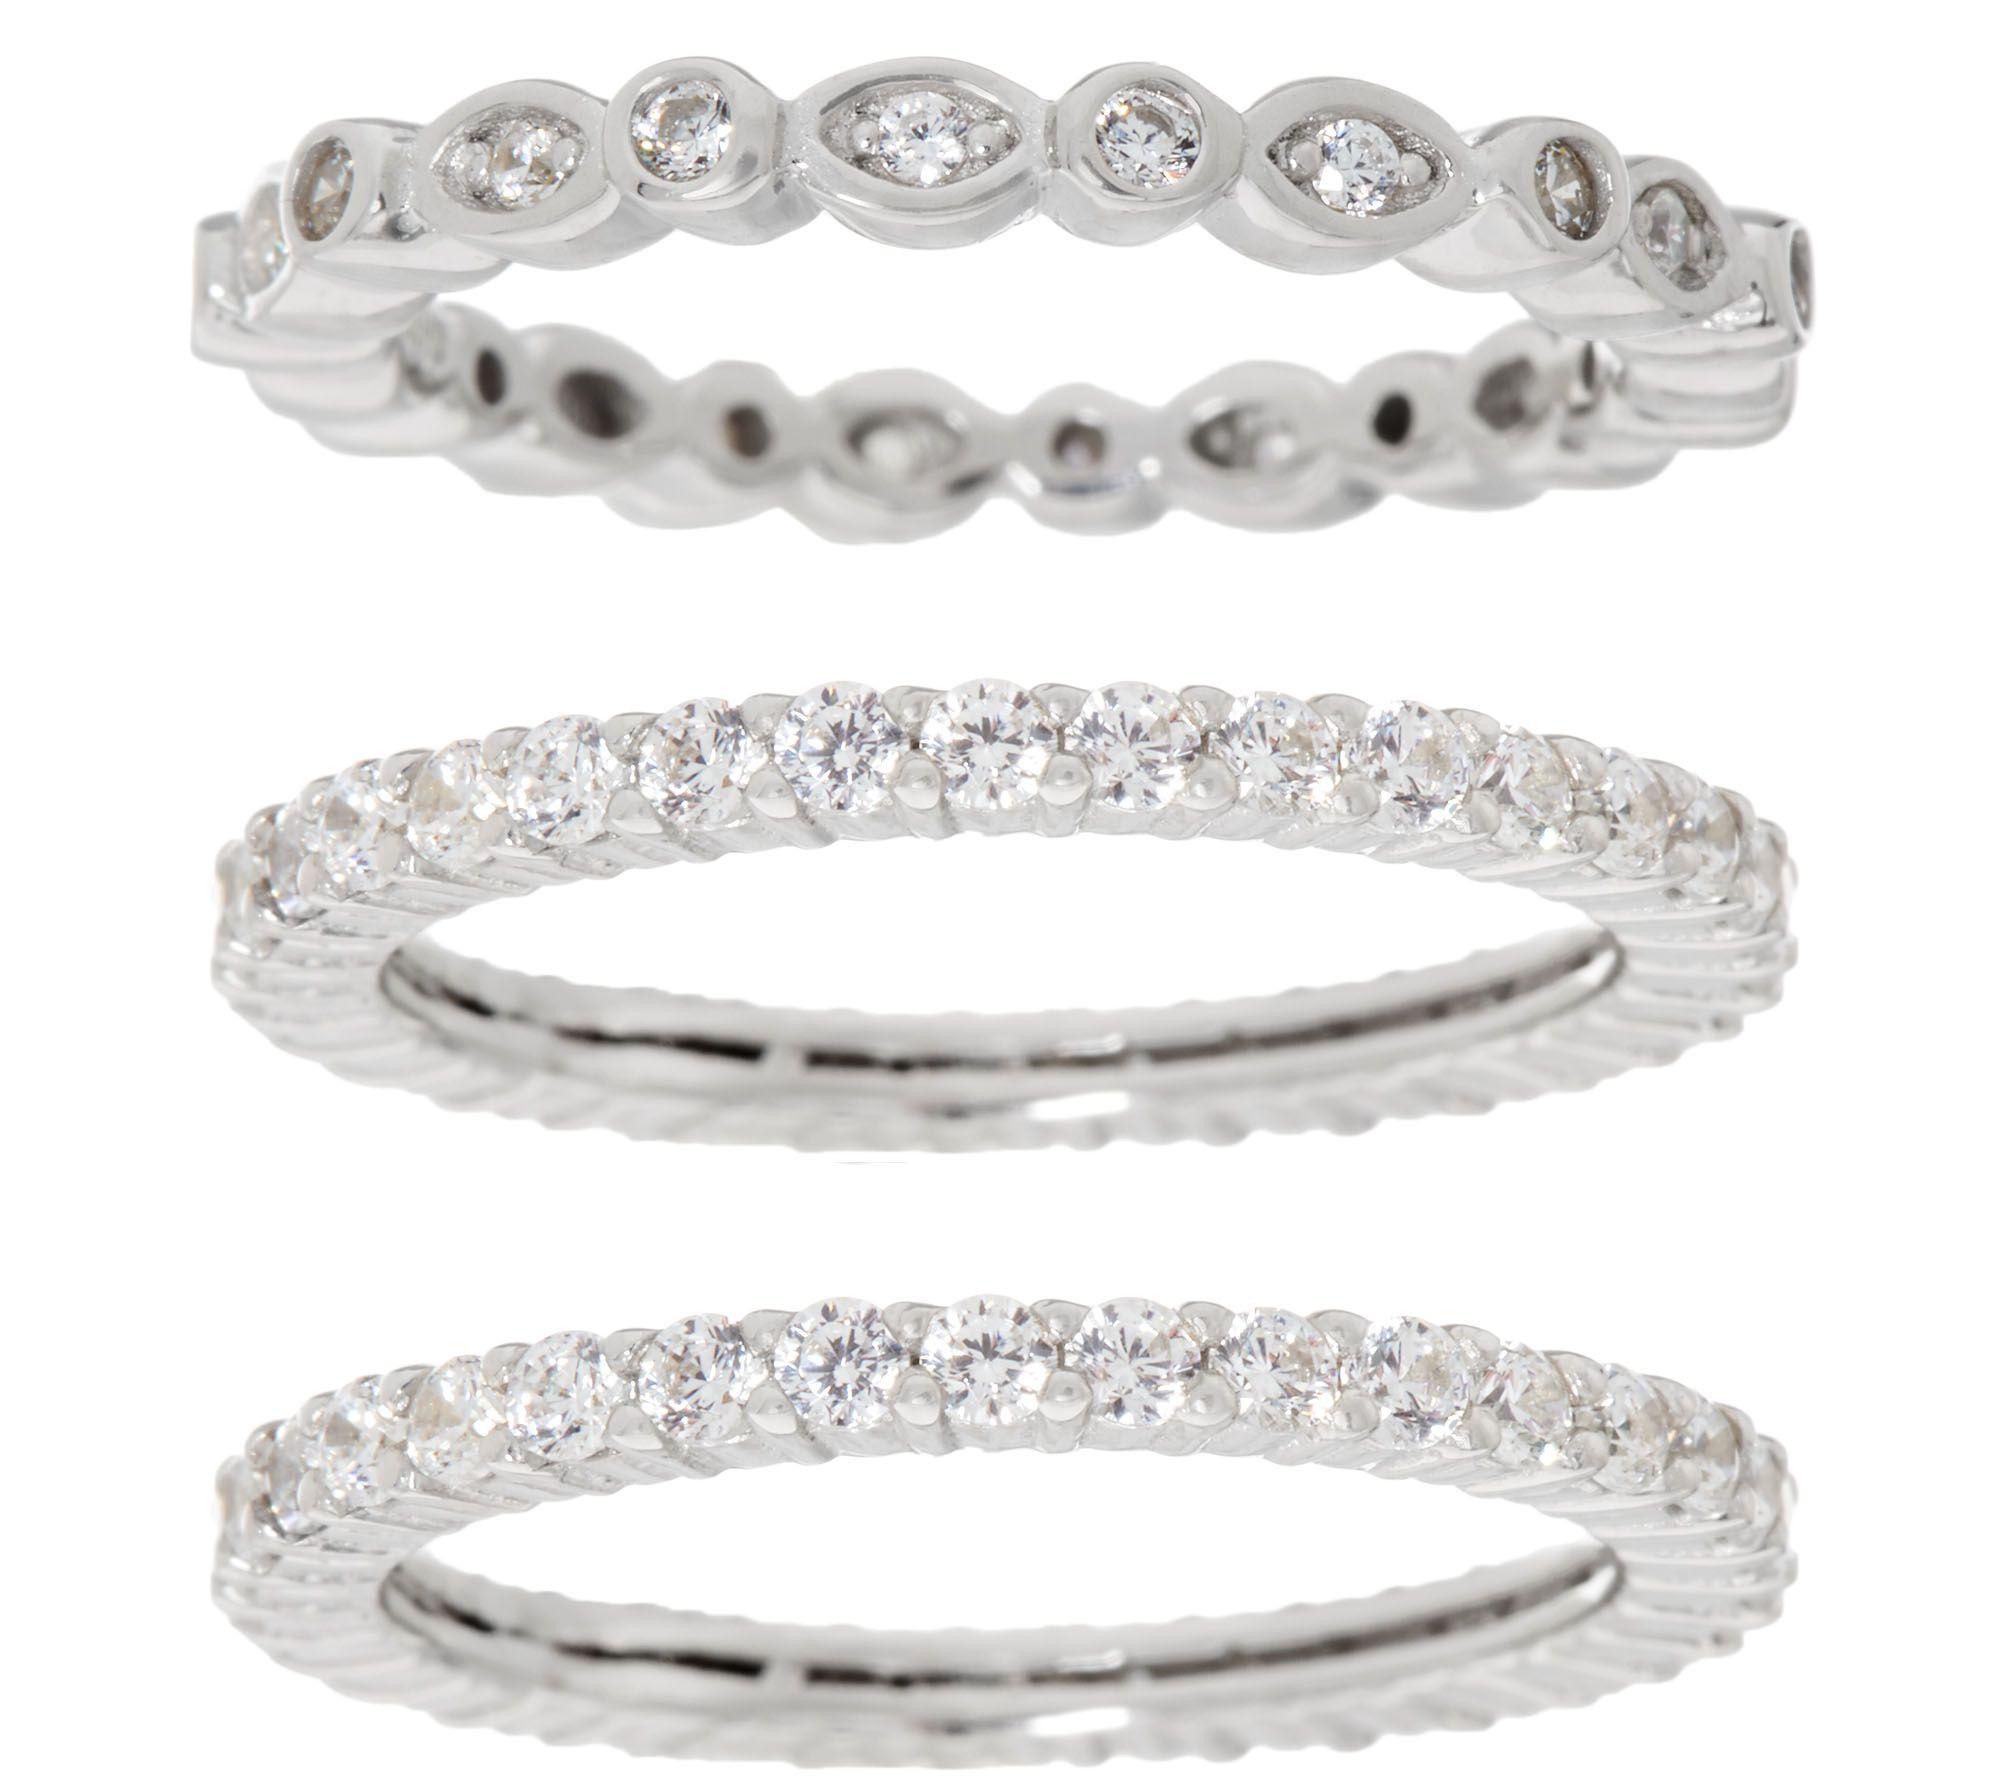 diamonique set of three eternity band rings sterling or 14k clad j334208 - Diamonique Wedding Rings